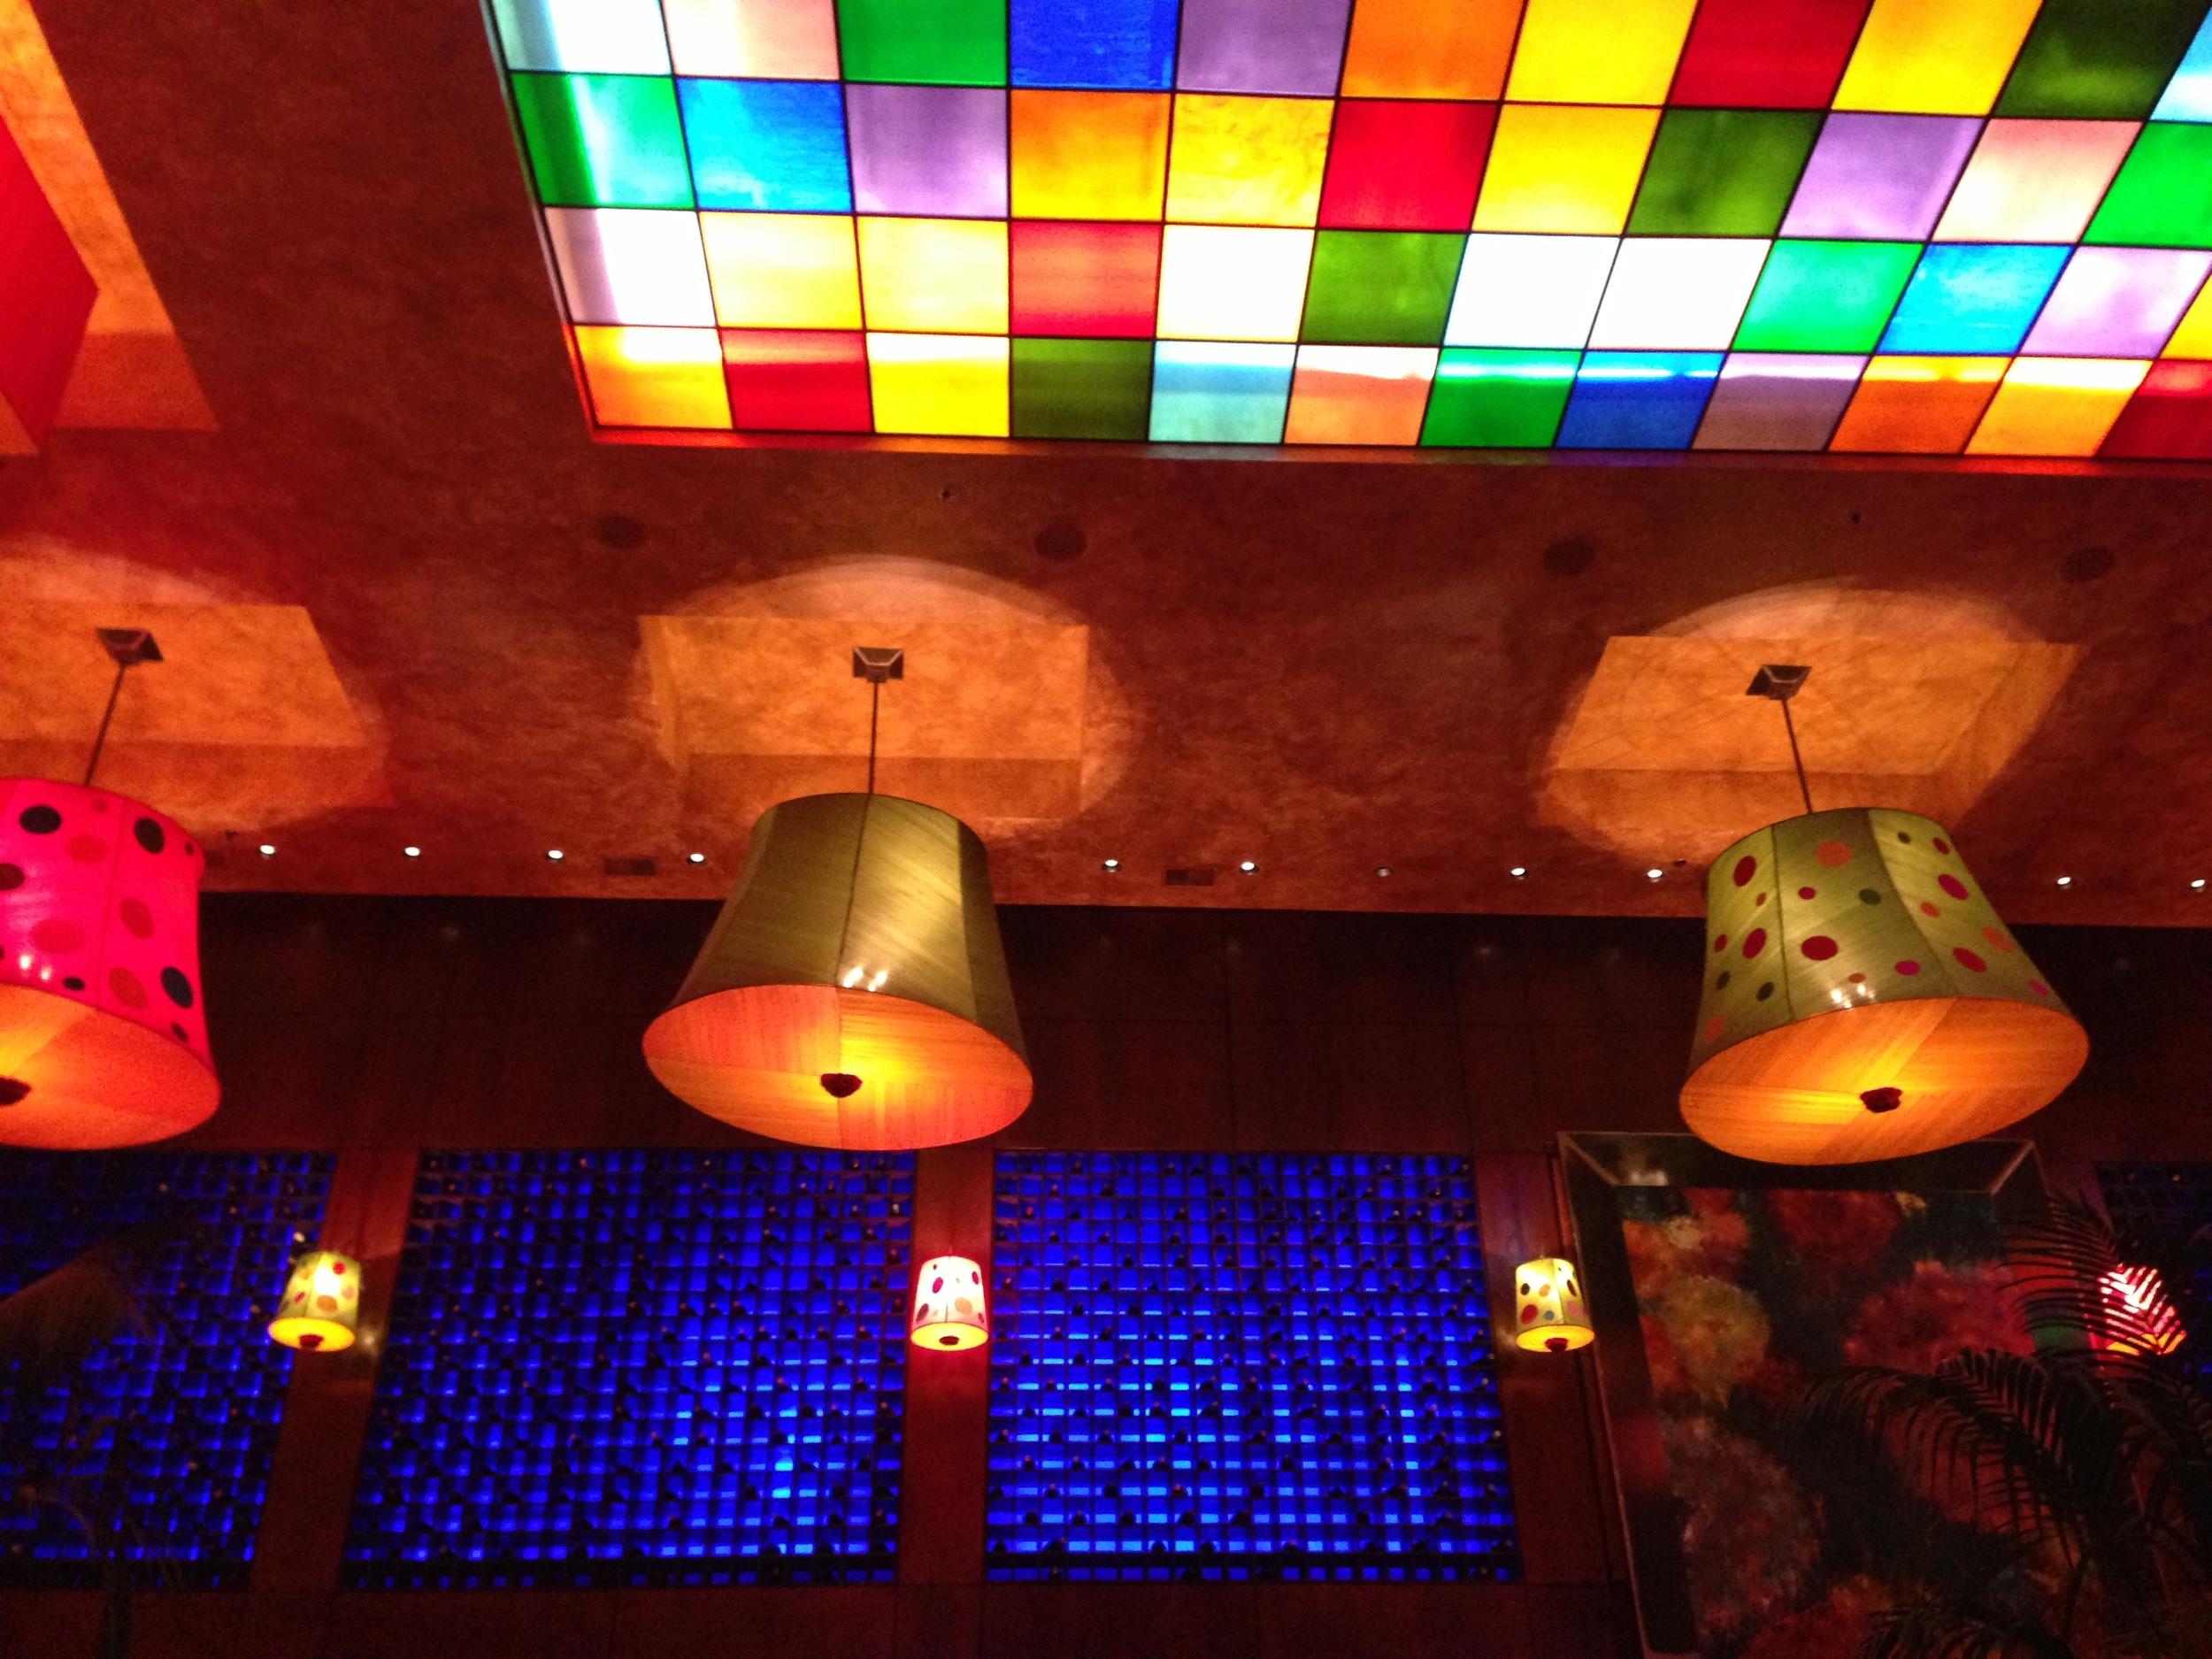 Figure 1. Colorful restaurant decorations